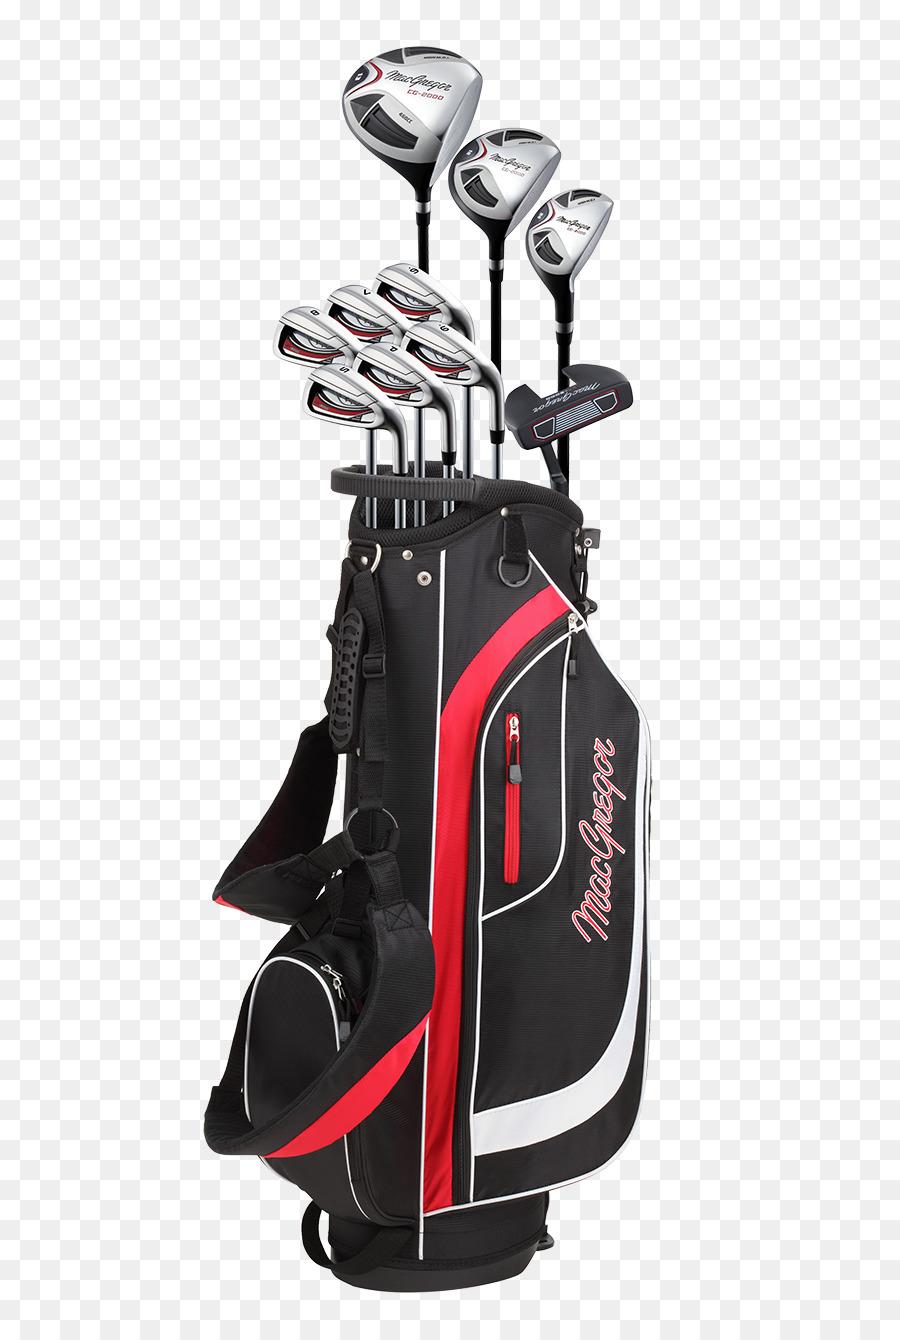 bcbcd7a8dfba Golf Clubs MacGregor Golf Golf equipment Sporting Goods - Golf png ...